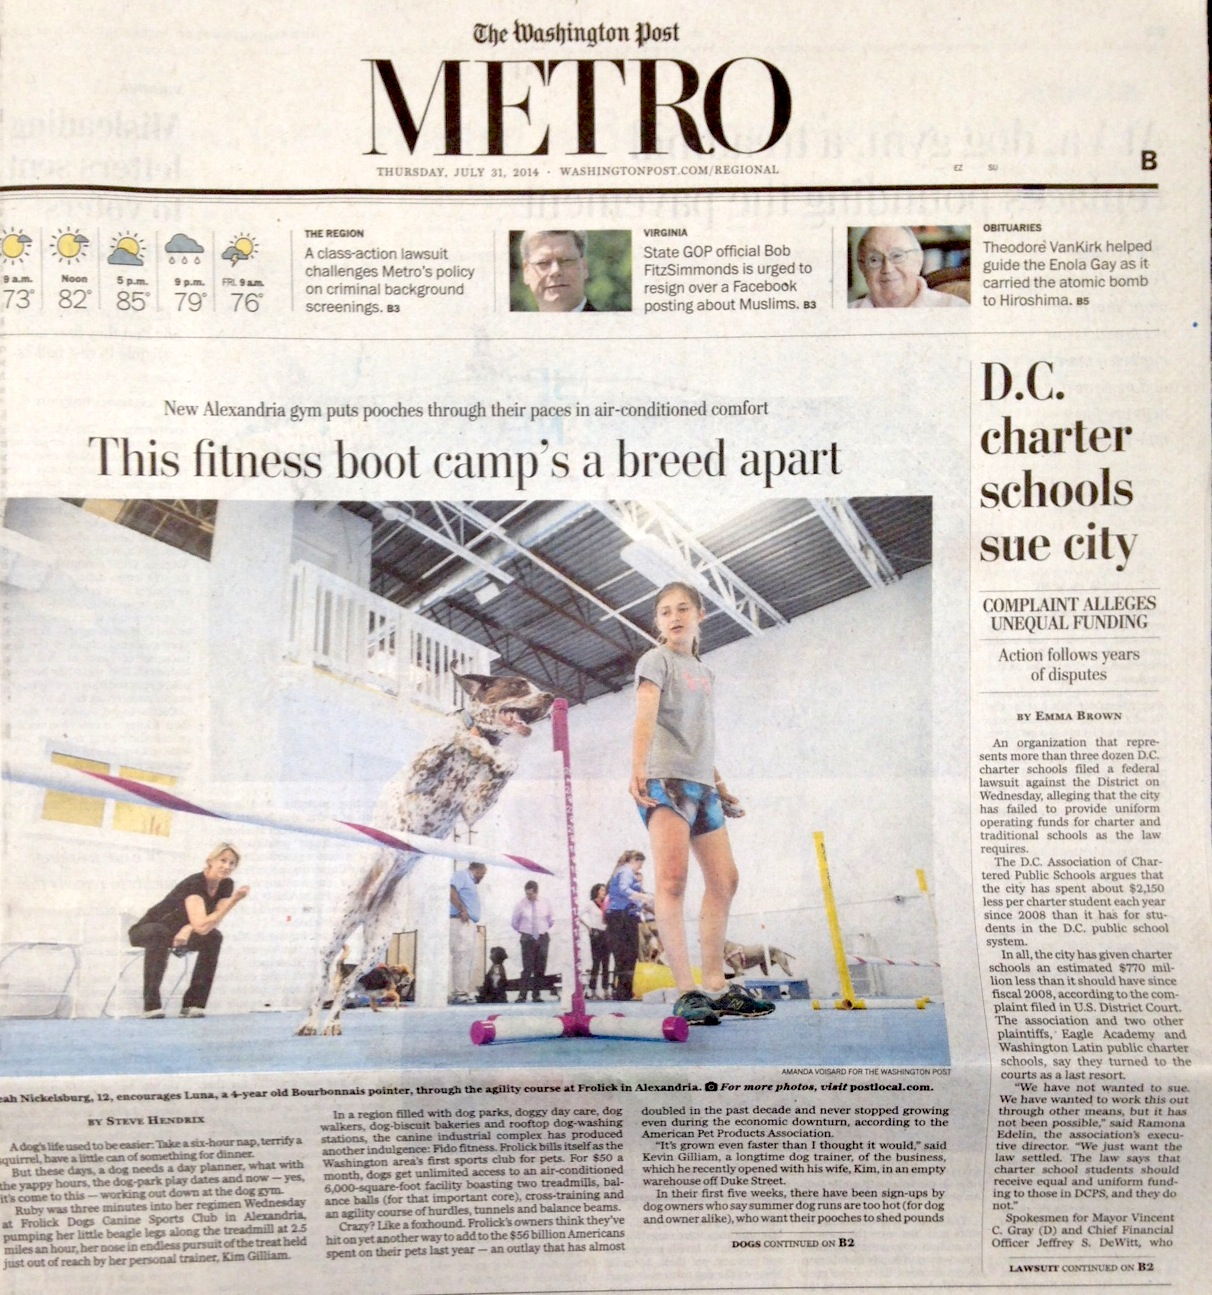 Washington Post, July 30 2014